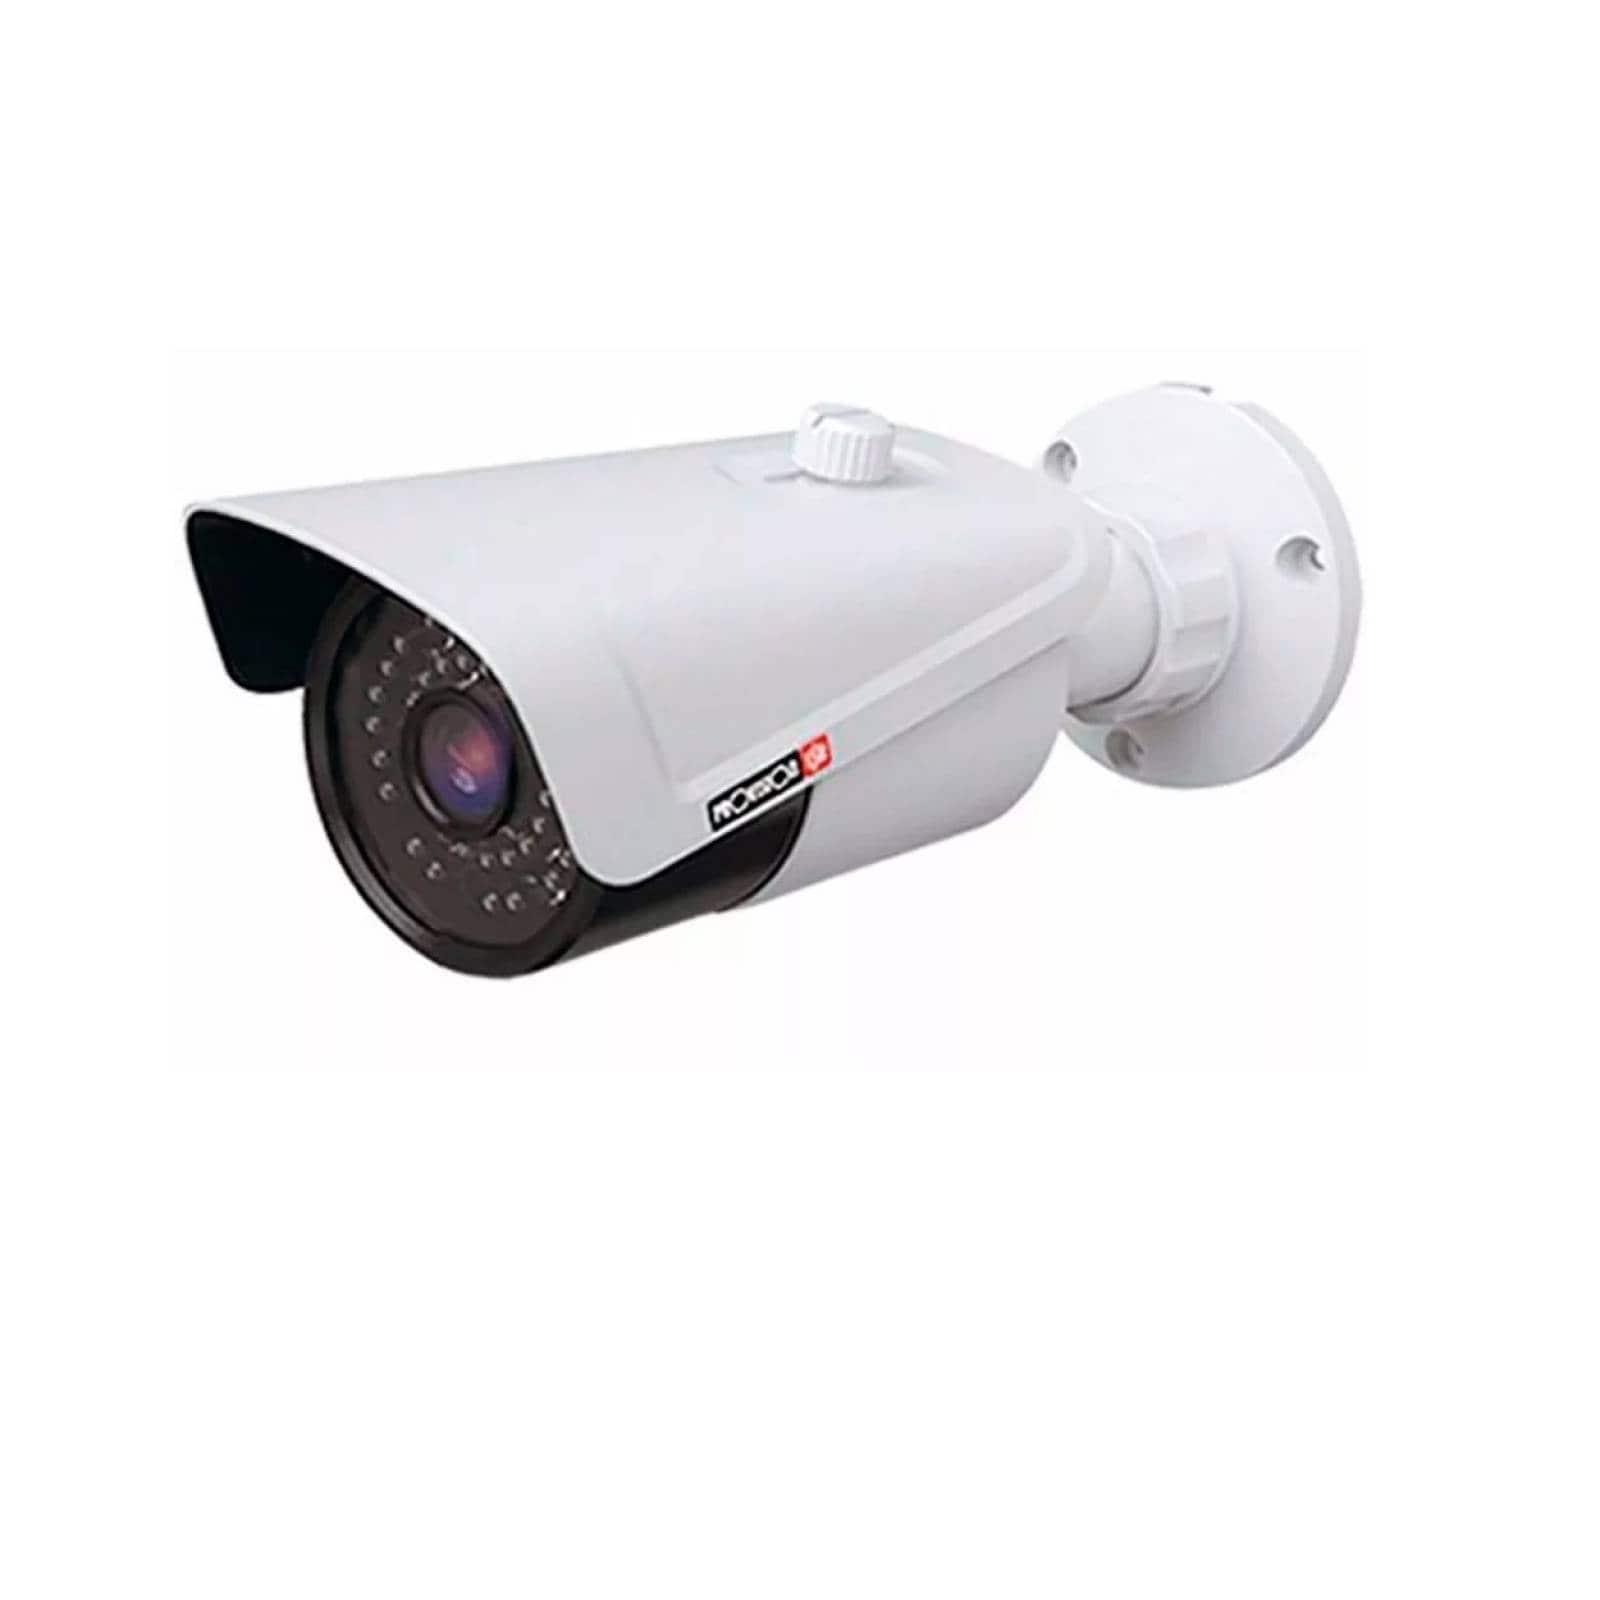 Camara De Vigilancia Provision Isr I3-340ip536 Eye-sing Poe